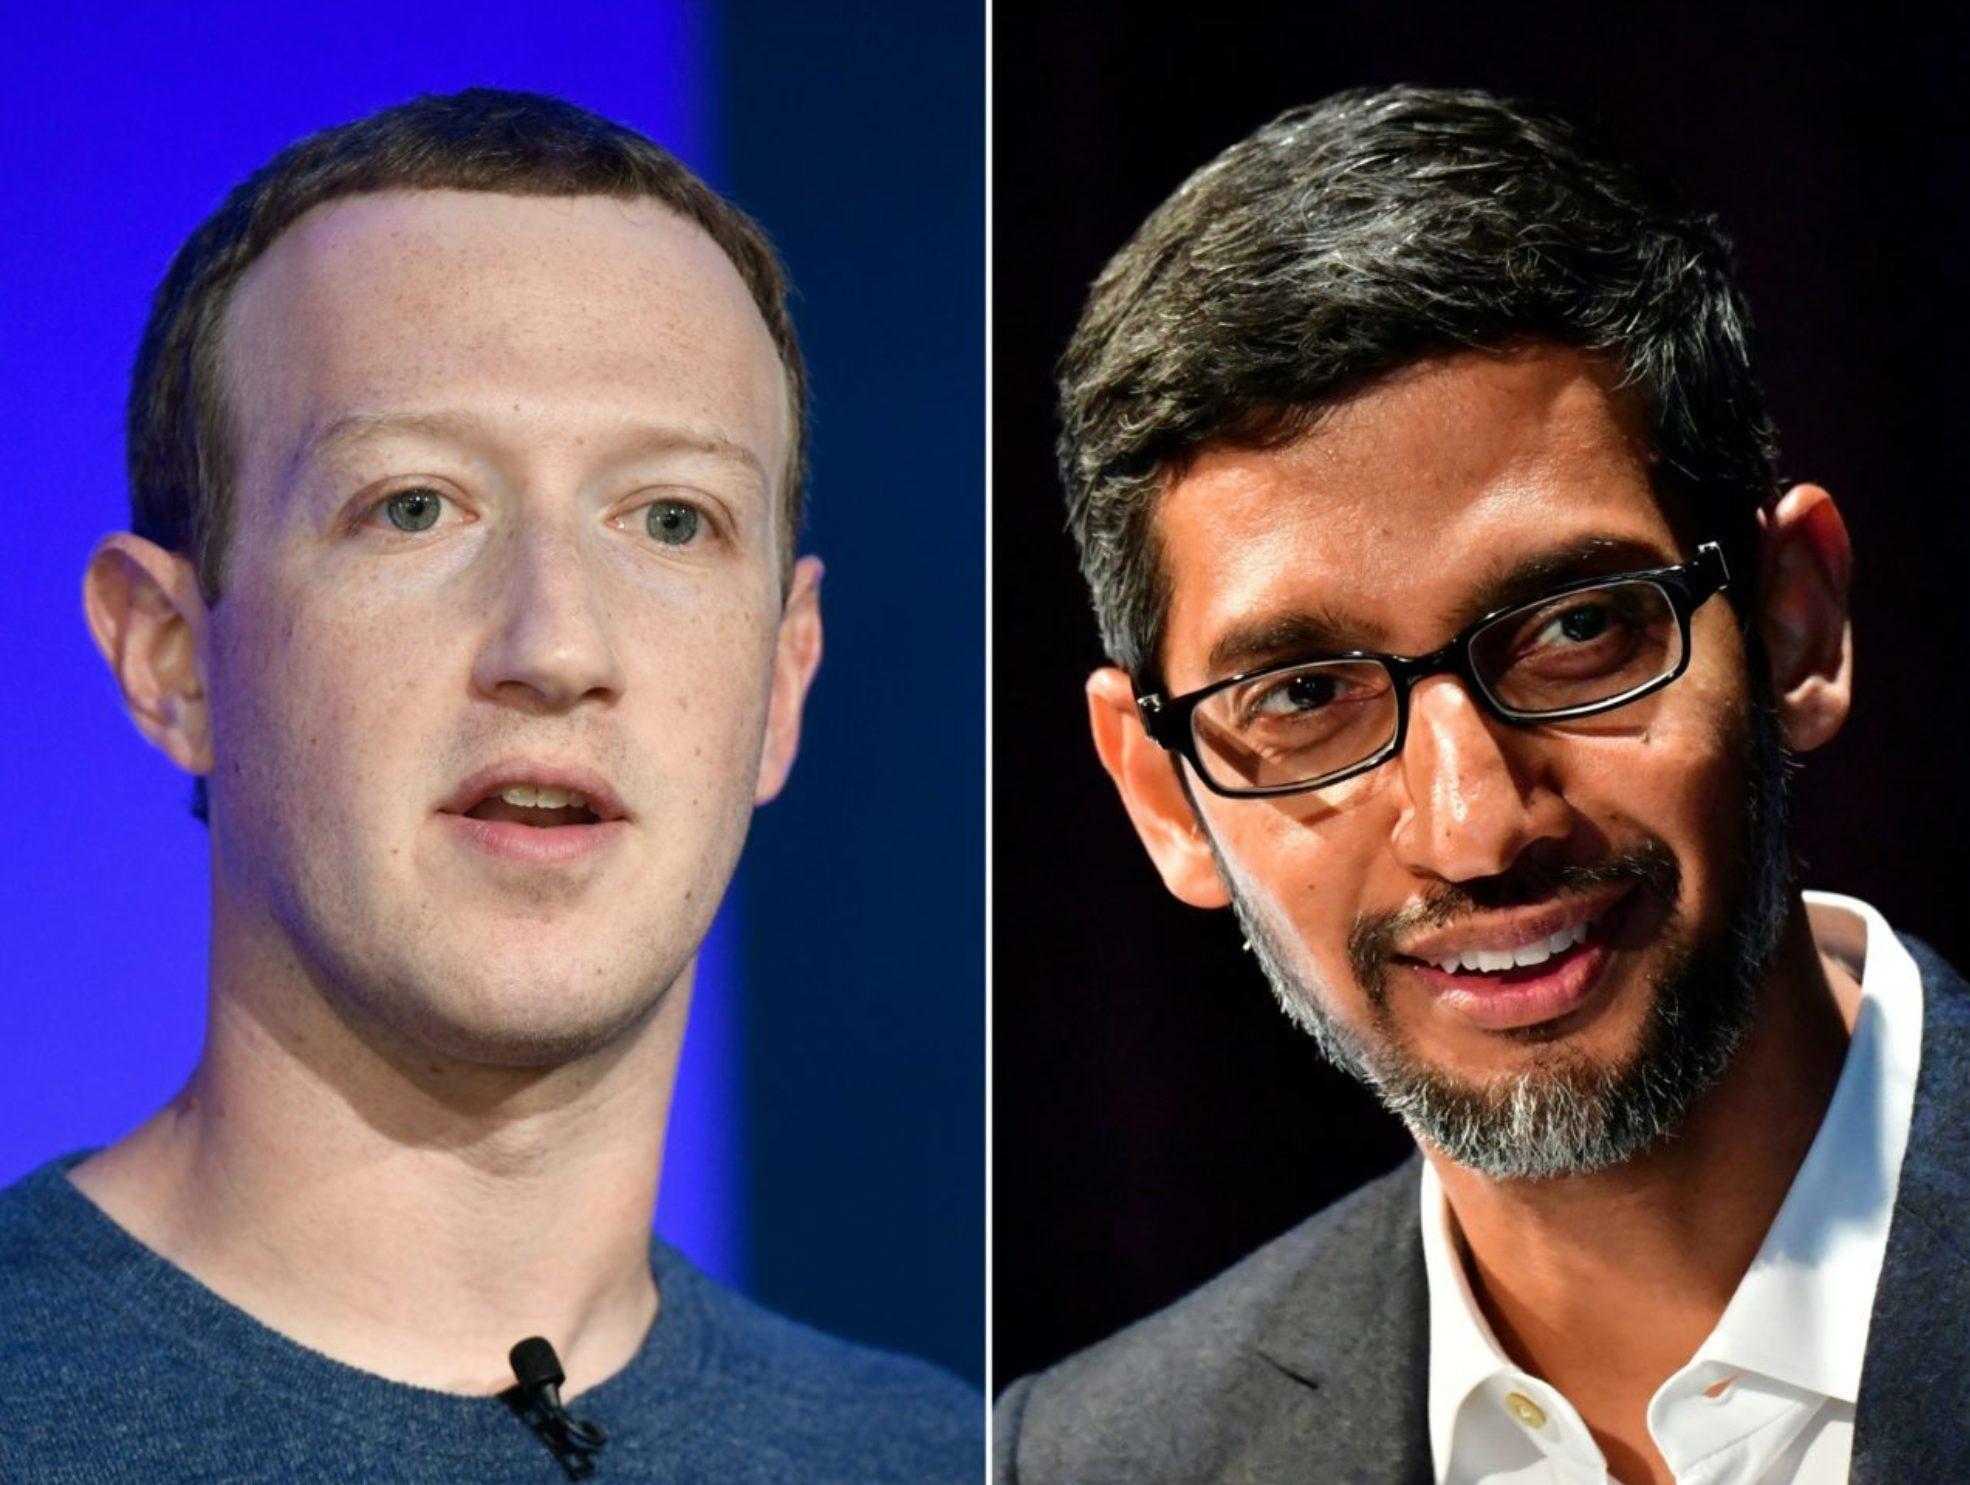 Facebook CEO Mark Zuckerberg alongside Google CEO Sundar Pichai. (Photo by BERTRAND GUAY,TOBIAS SCHWARZ,ANGELA WEISS,MARK RALSTON/AFP via Getty Images)